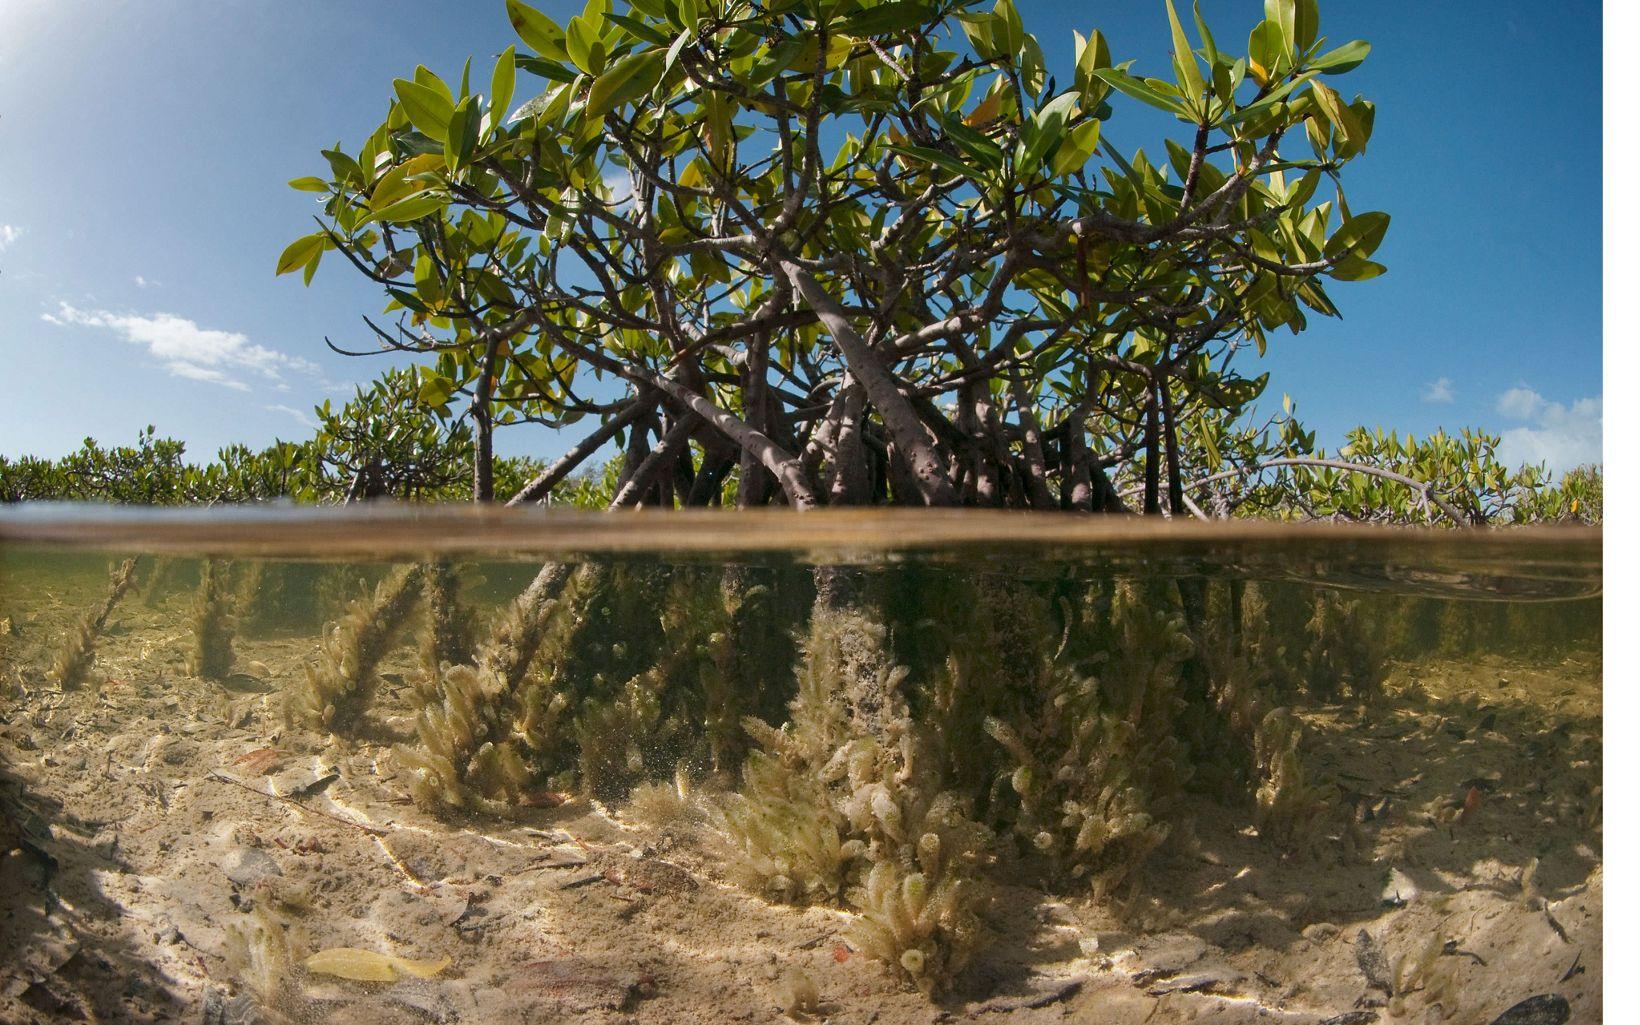 Mangrove in the shallow coastal salt flats of Warderick Wells Cay in the Bahamas Exuma Cays Land & Sea Park.